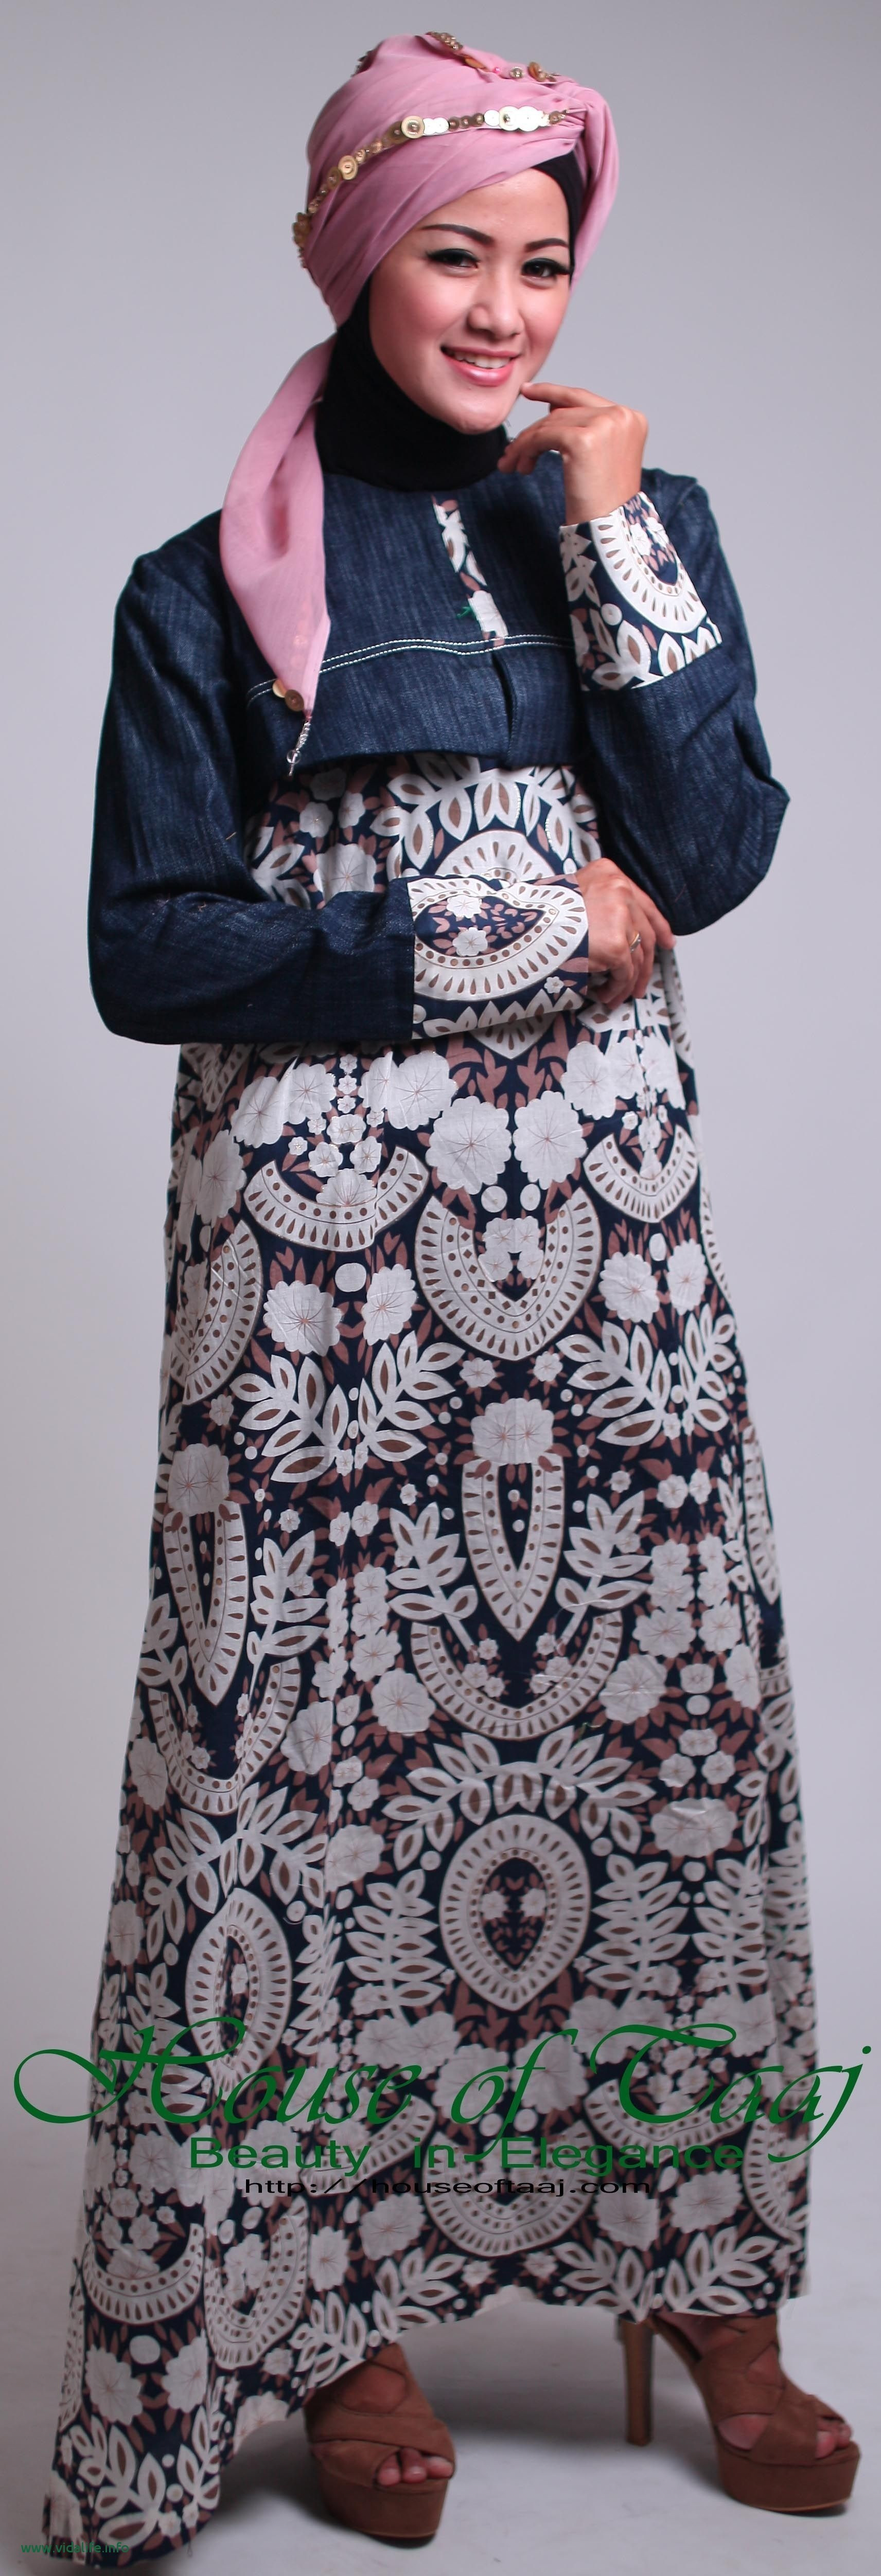 Gaun Pengantin Muslimah Modern Luxury Gaun Pengantin Muslimah Bagus Jual Mainboard W210cumb 0d